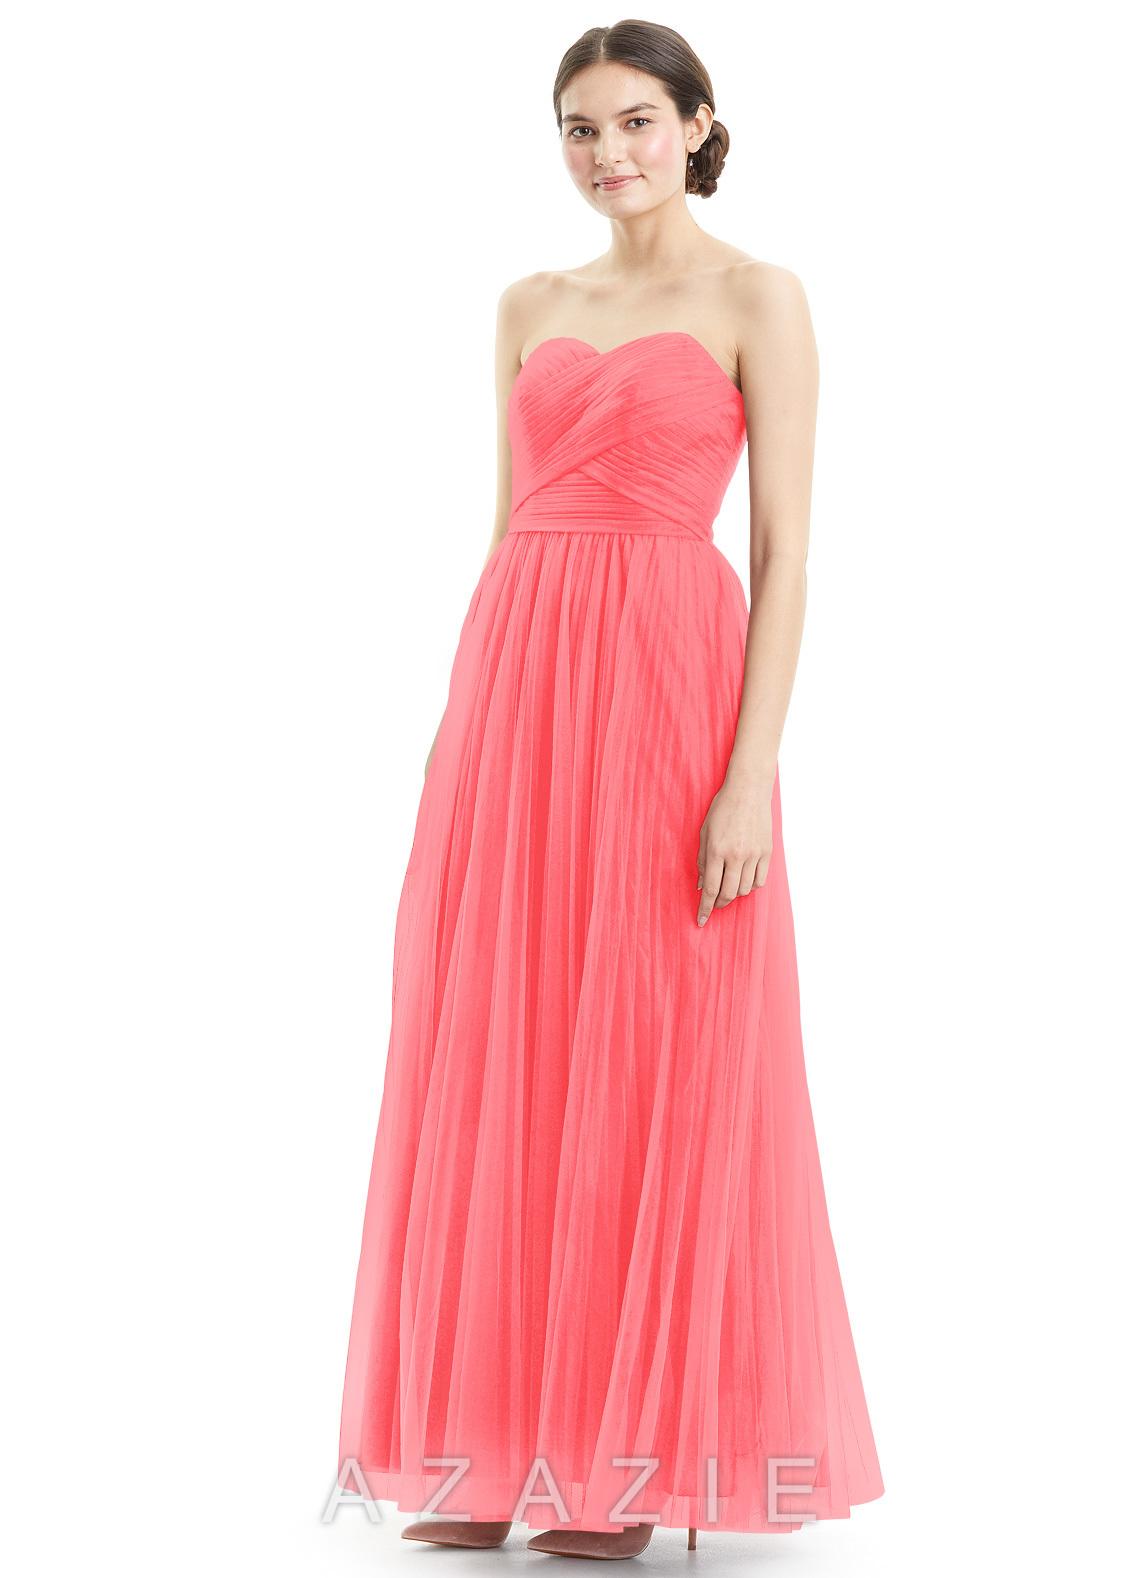 Azazie mavis bridesmaid dress azazie color watermelon ombrellifo Image collections